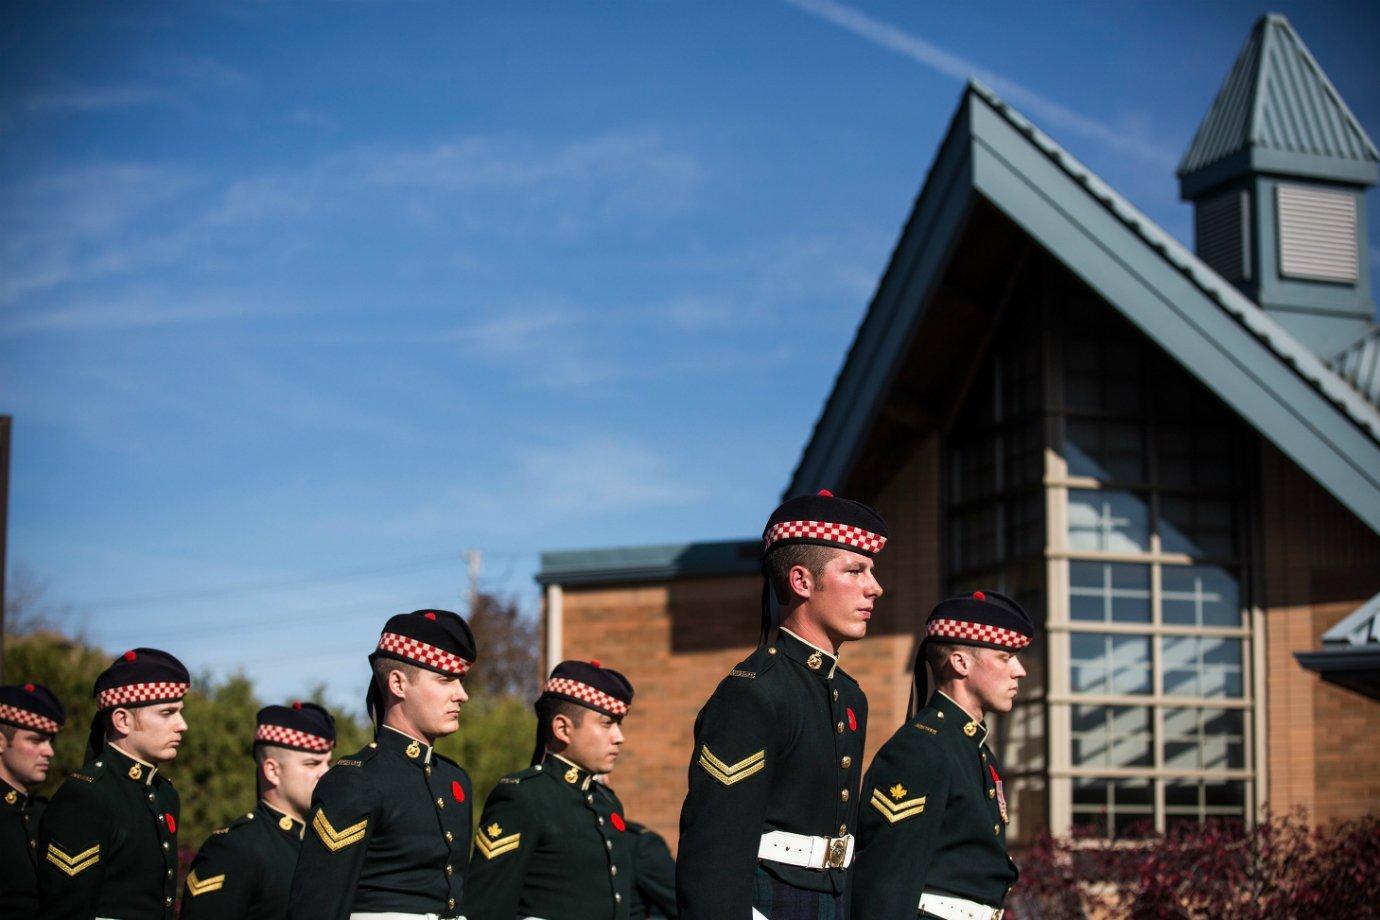 Soldados do Canadá